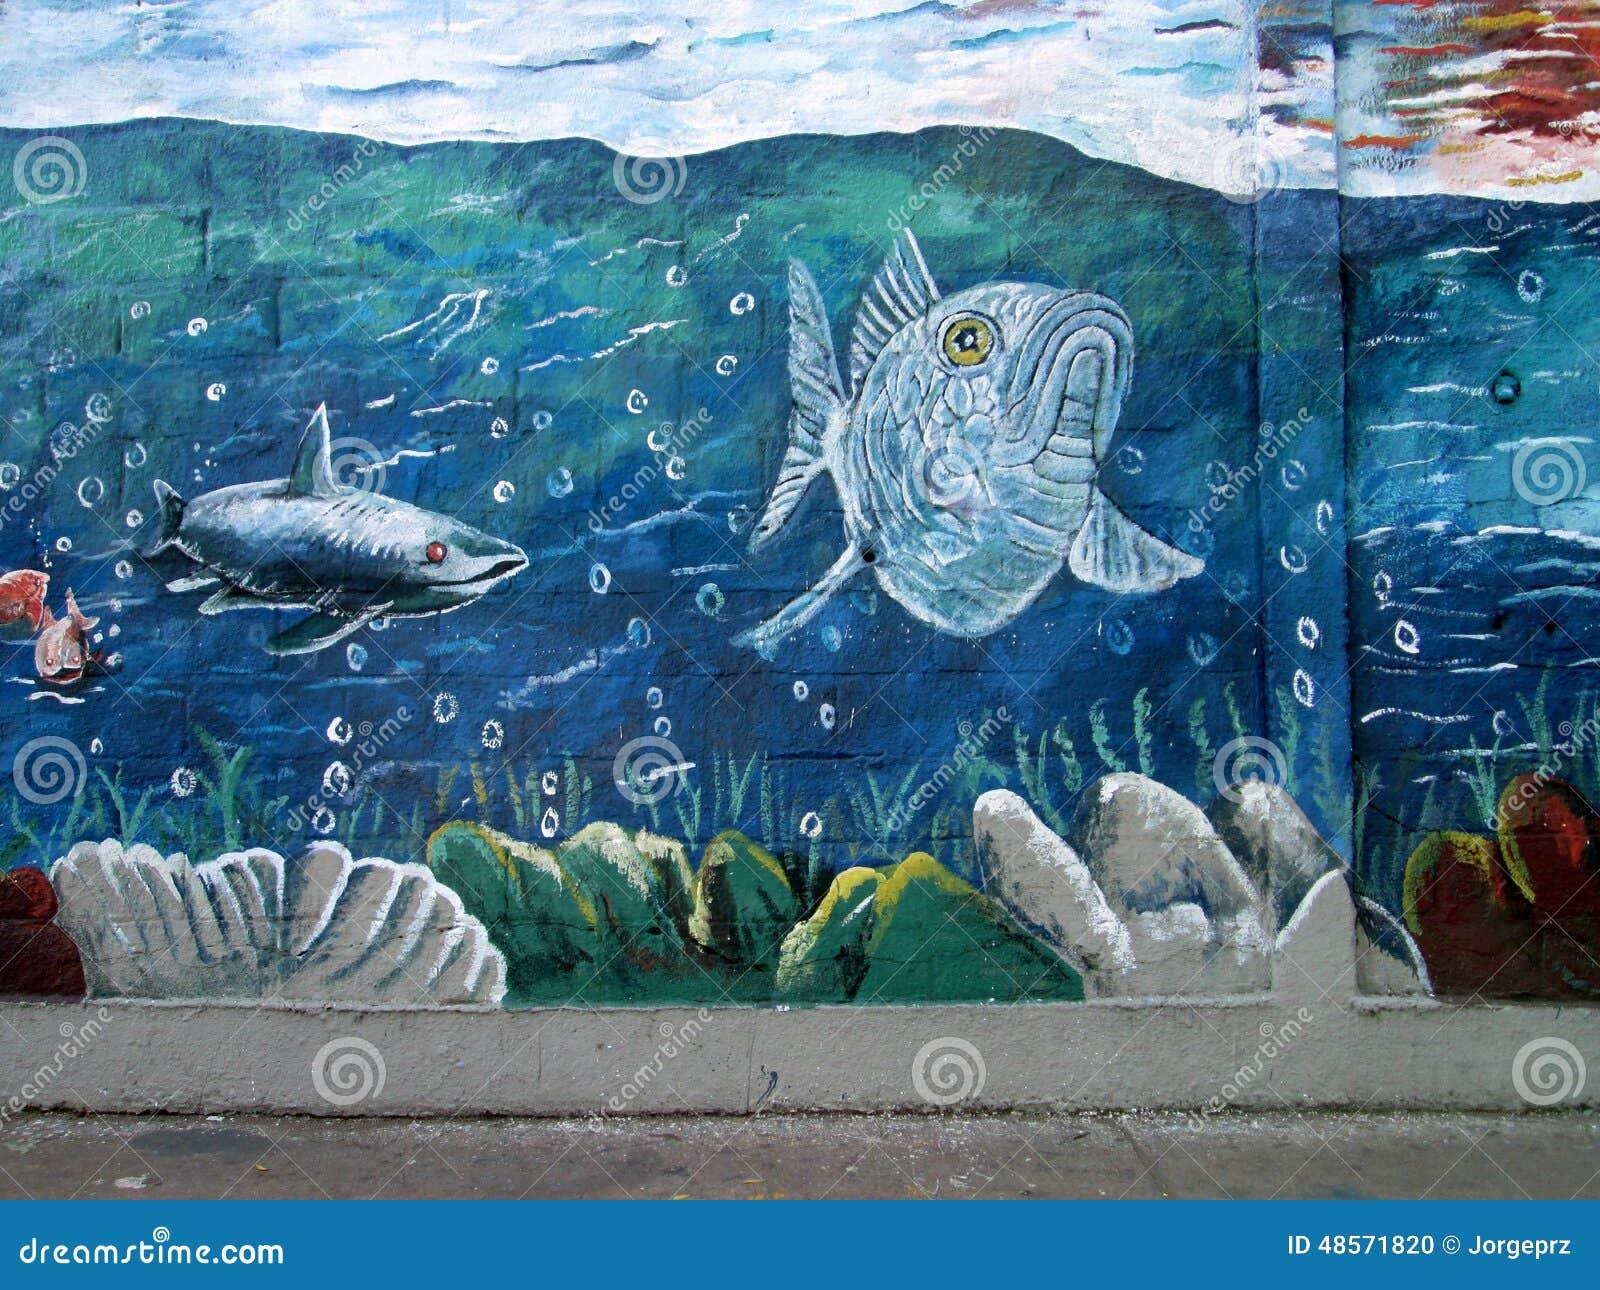 Urban ARt. Marine life.